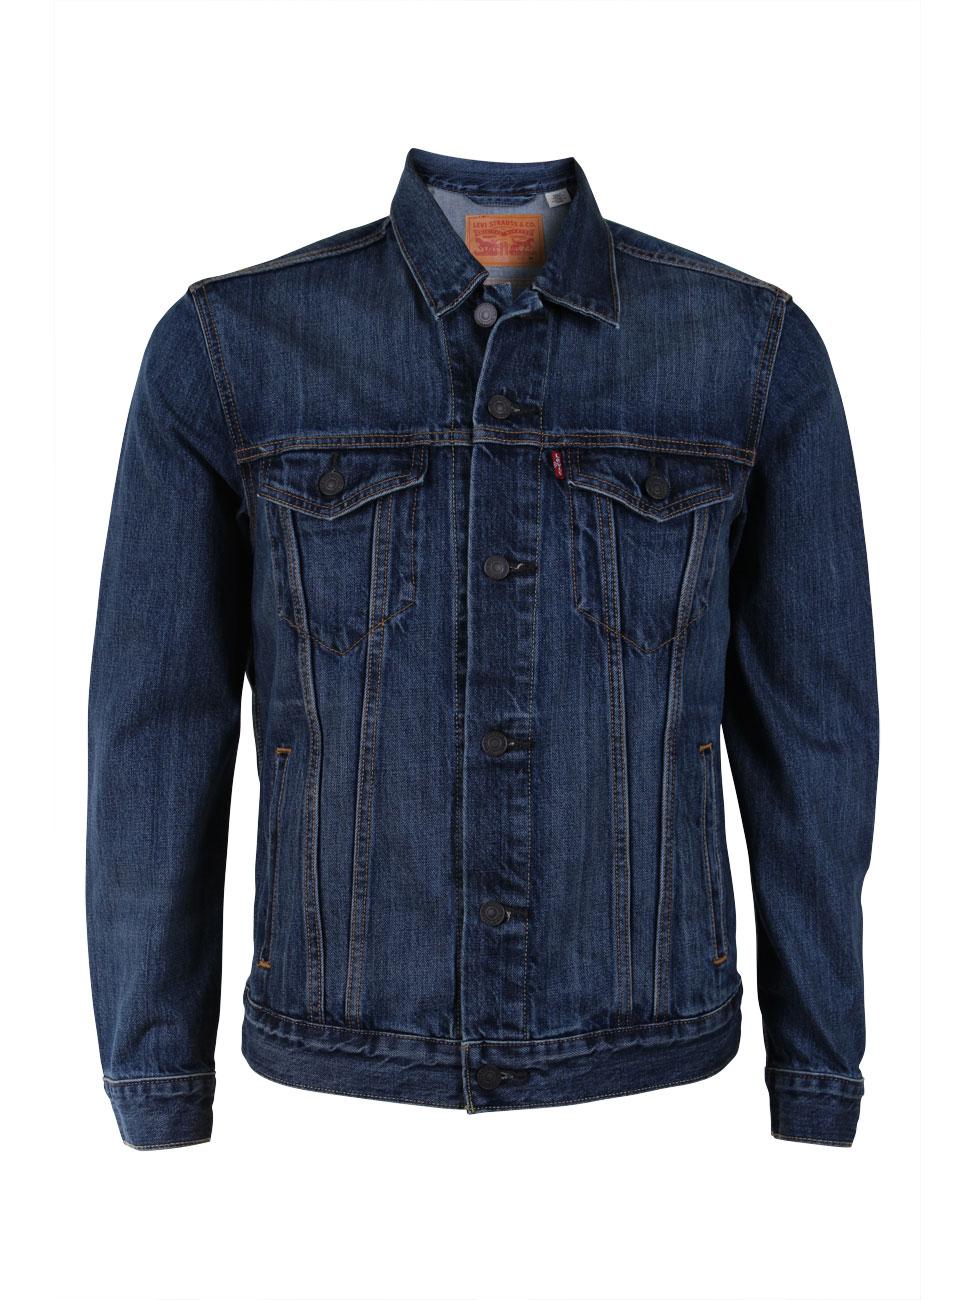 levi 39 s herren jeansjacke the trucker jacket regular fit blau the shelf kaufen bei jeans. Black Bedroom Furniture Sets. Home Design Ideas